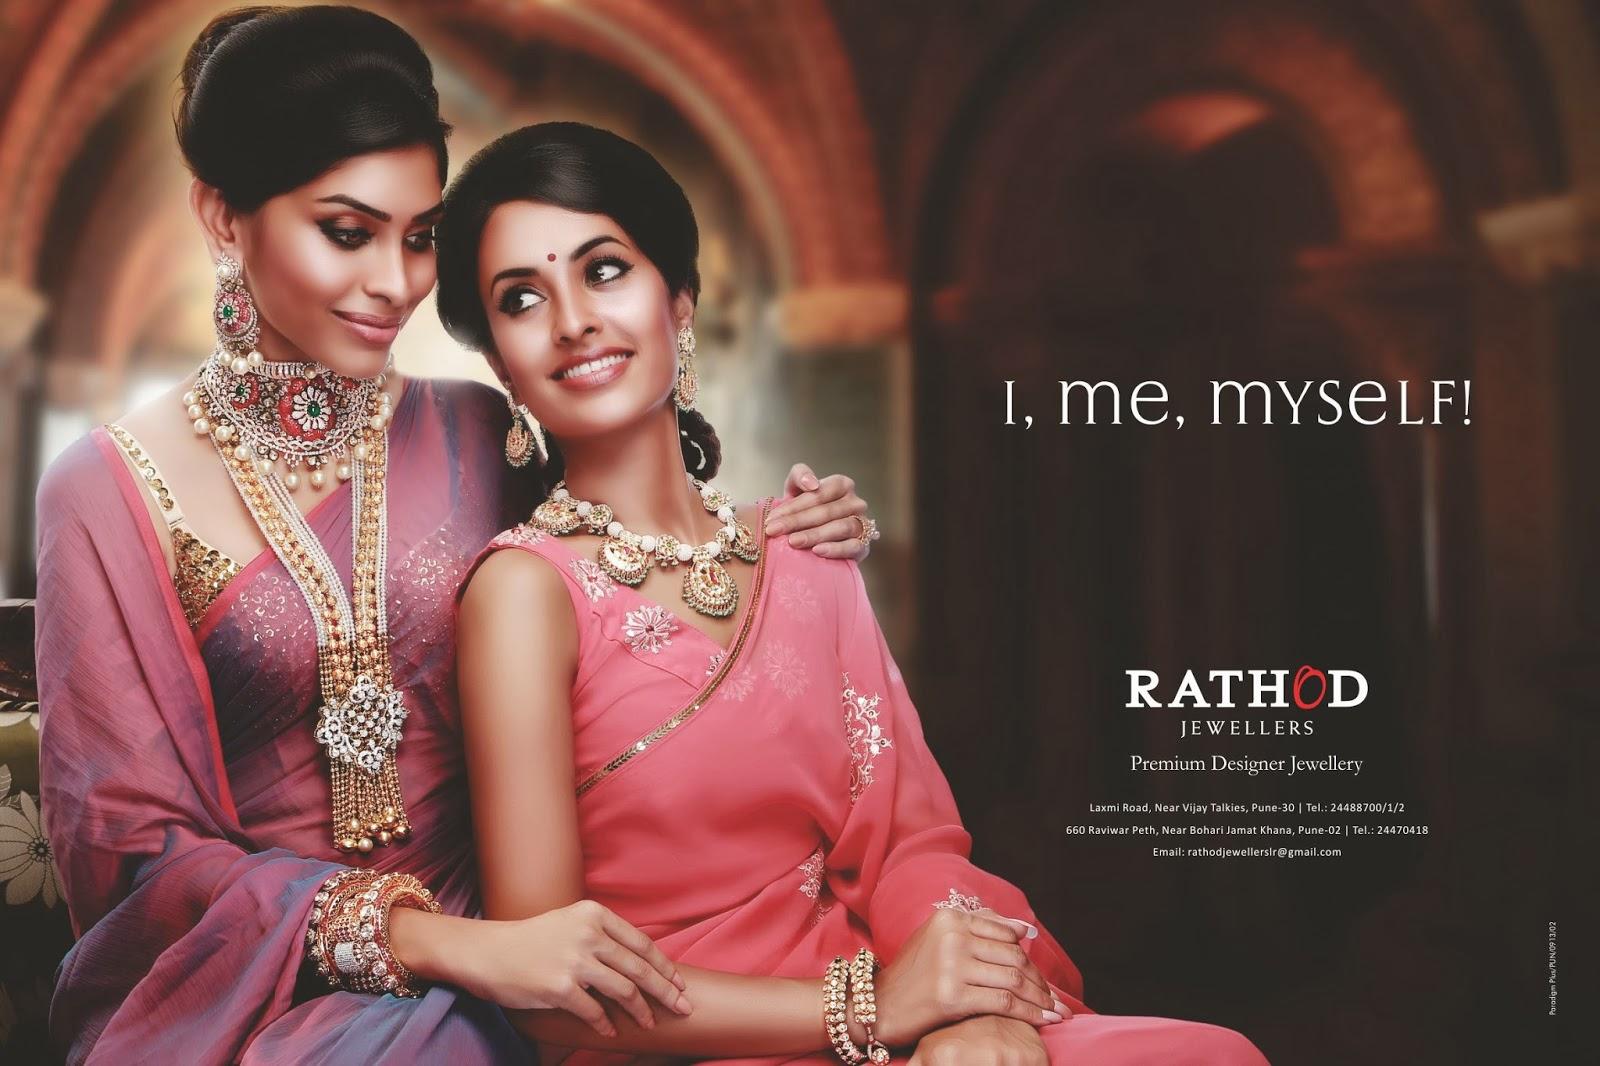 Rathod Jewellers Pune